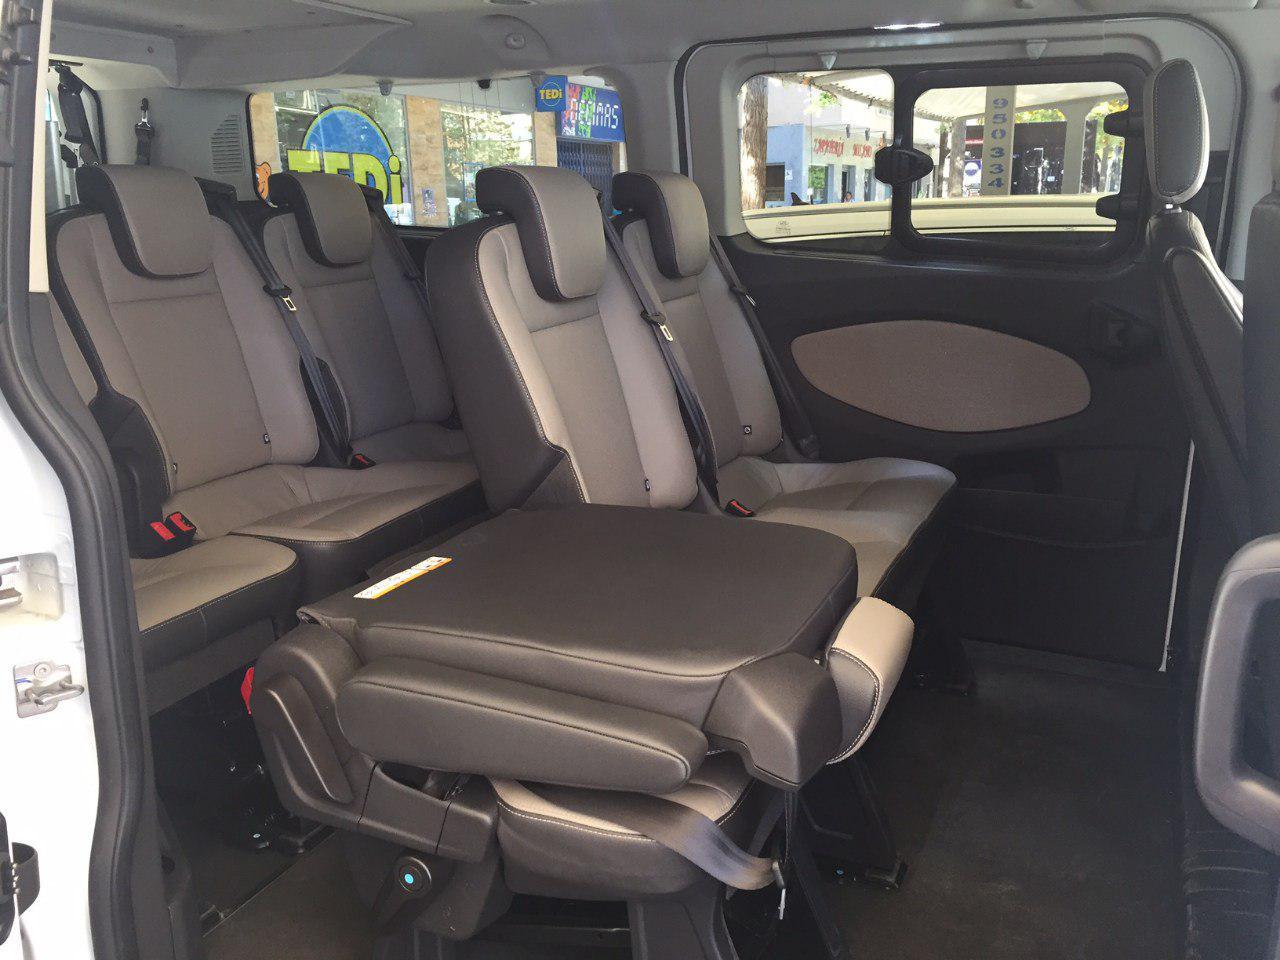 9 Seater Vehicles Taxiponiente Taxi Service Almeria